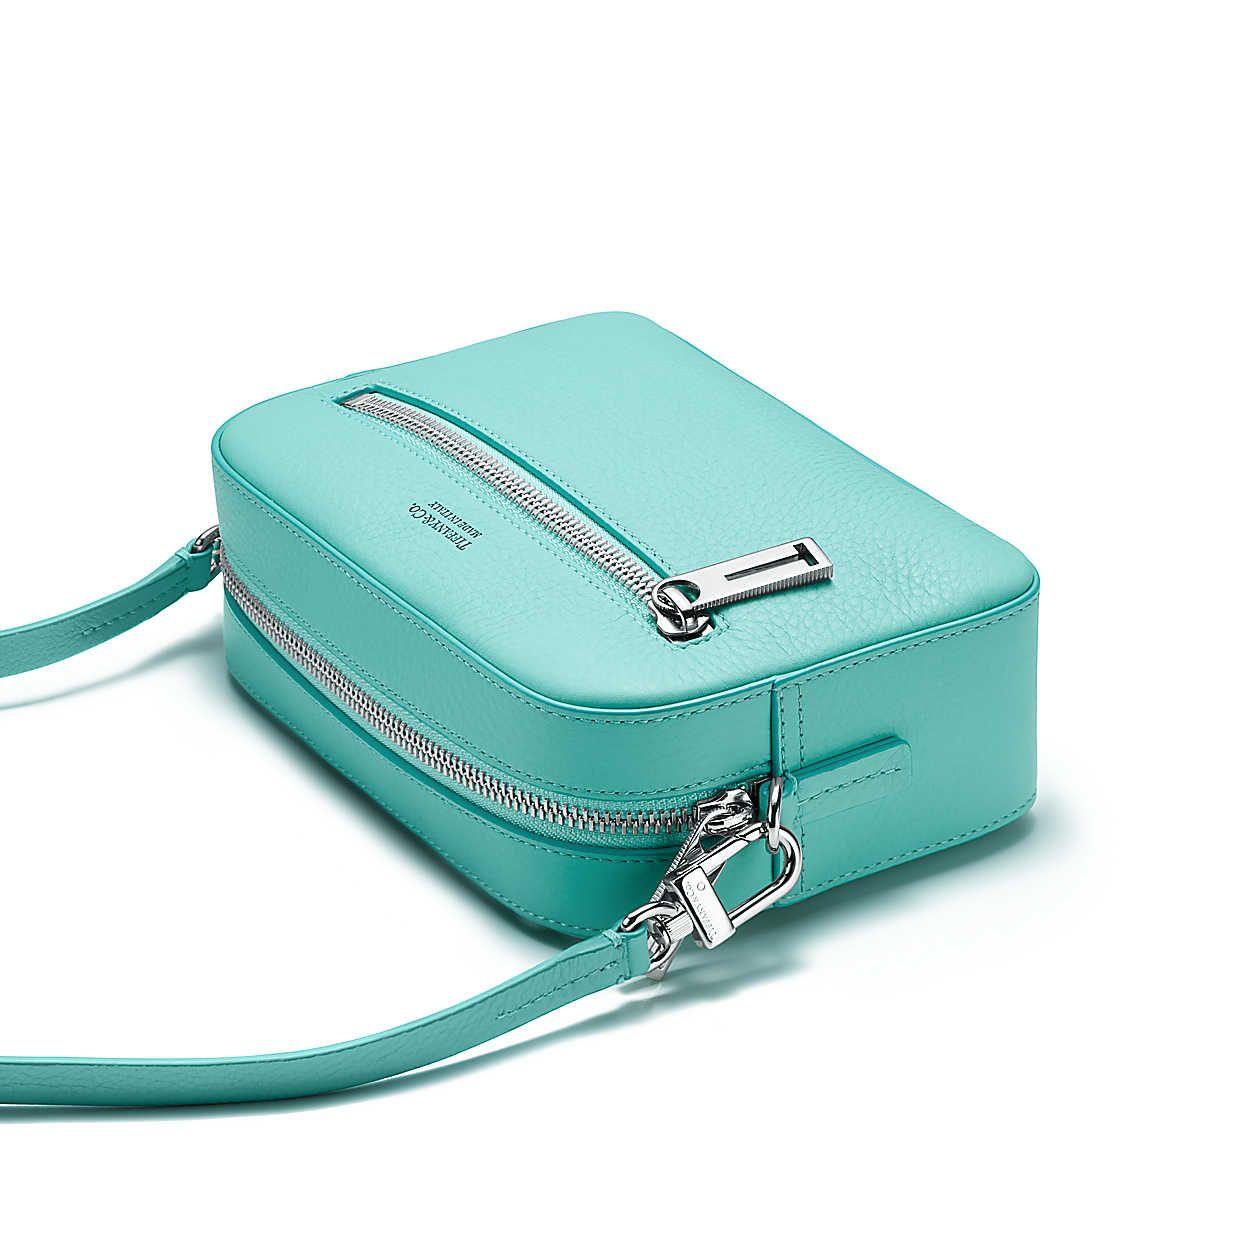 Crossbody Bag In Tiffany Blue Grain Calfskin Leather Tiffany Co Purses And Handbags Trending Handbag Affordable Bag